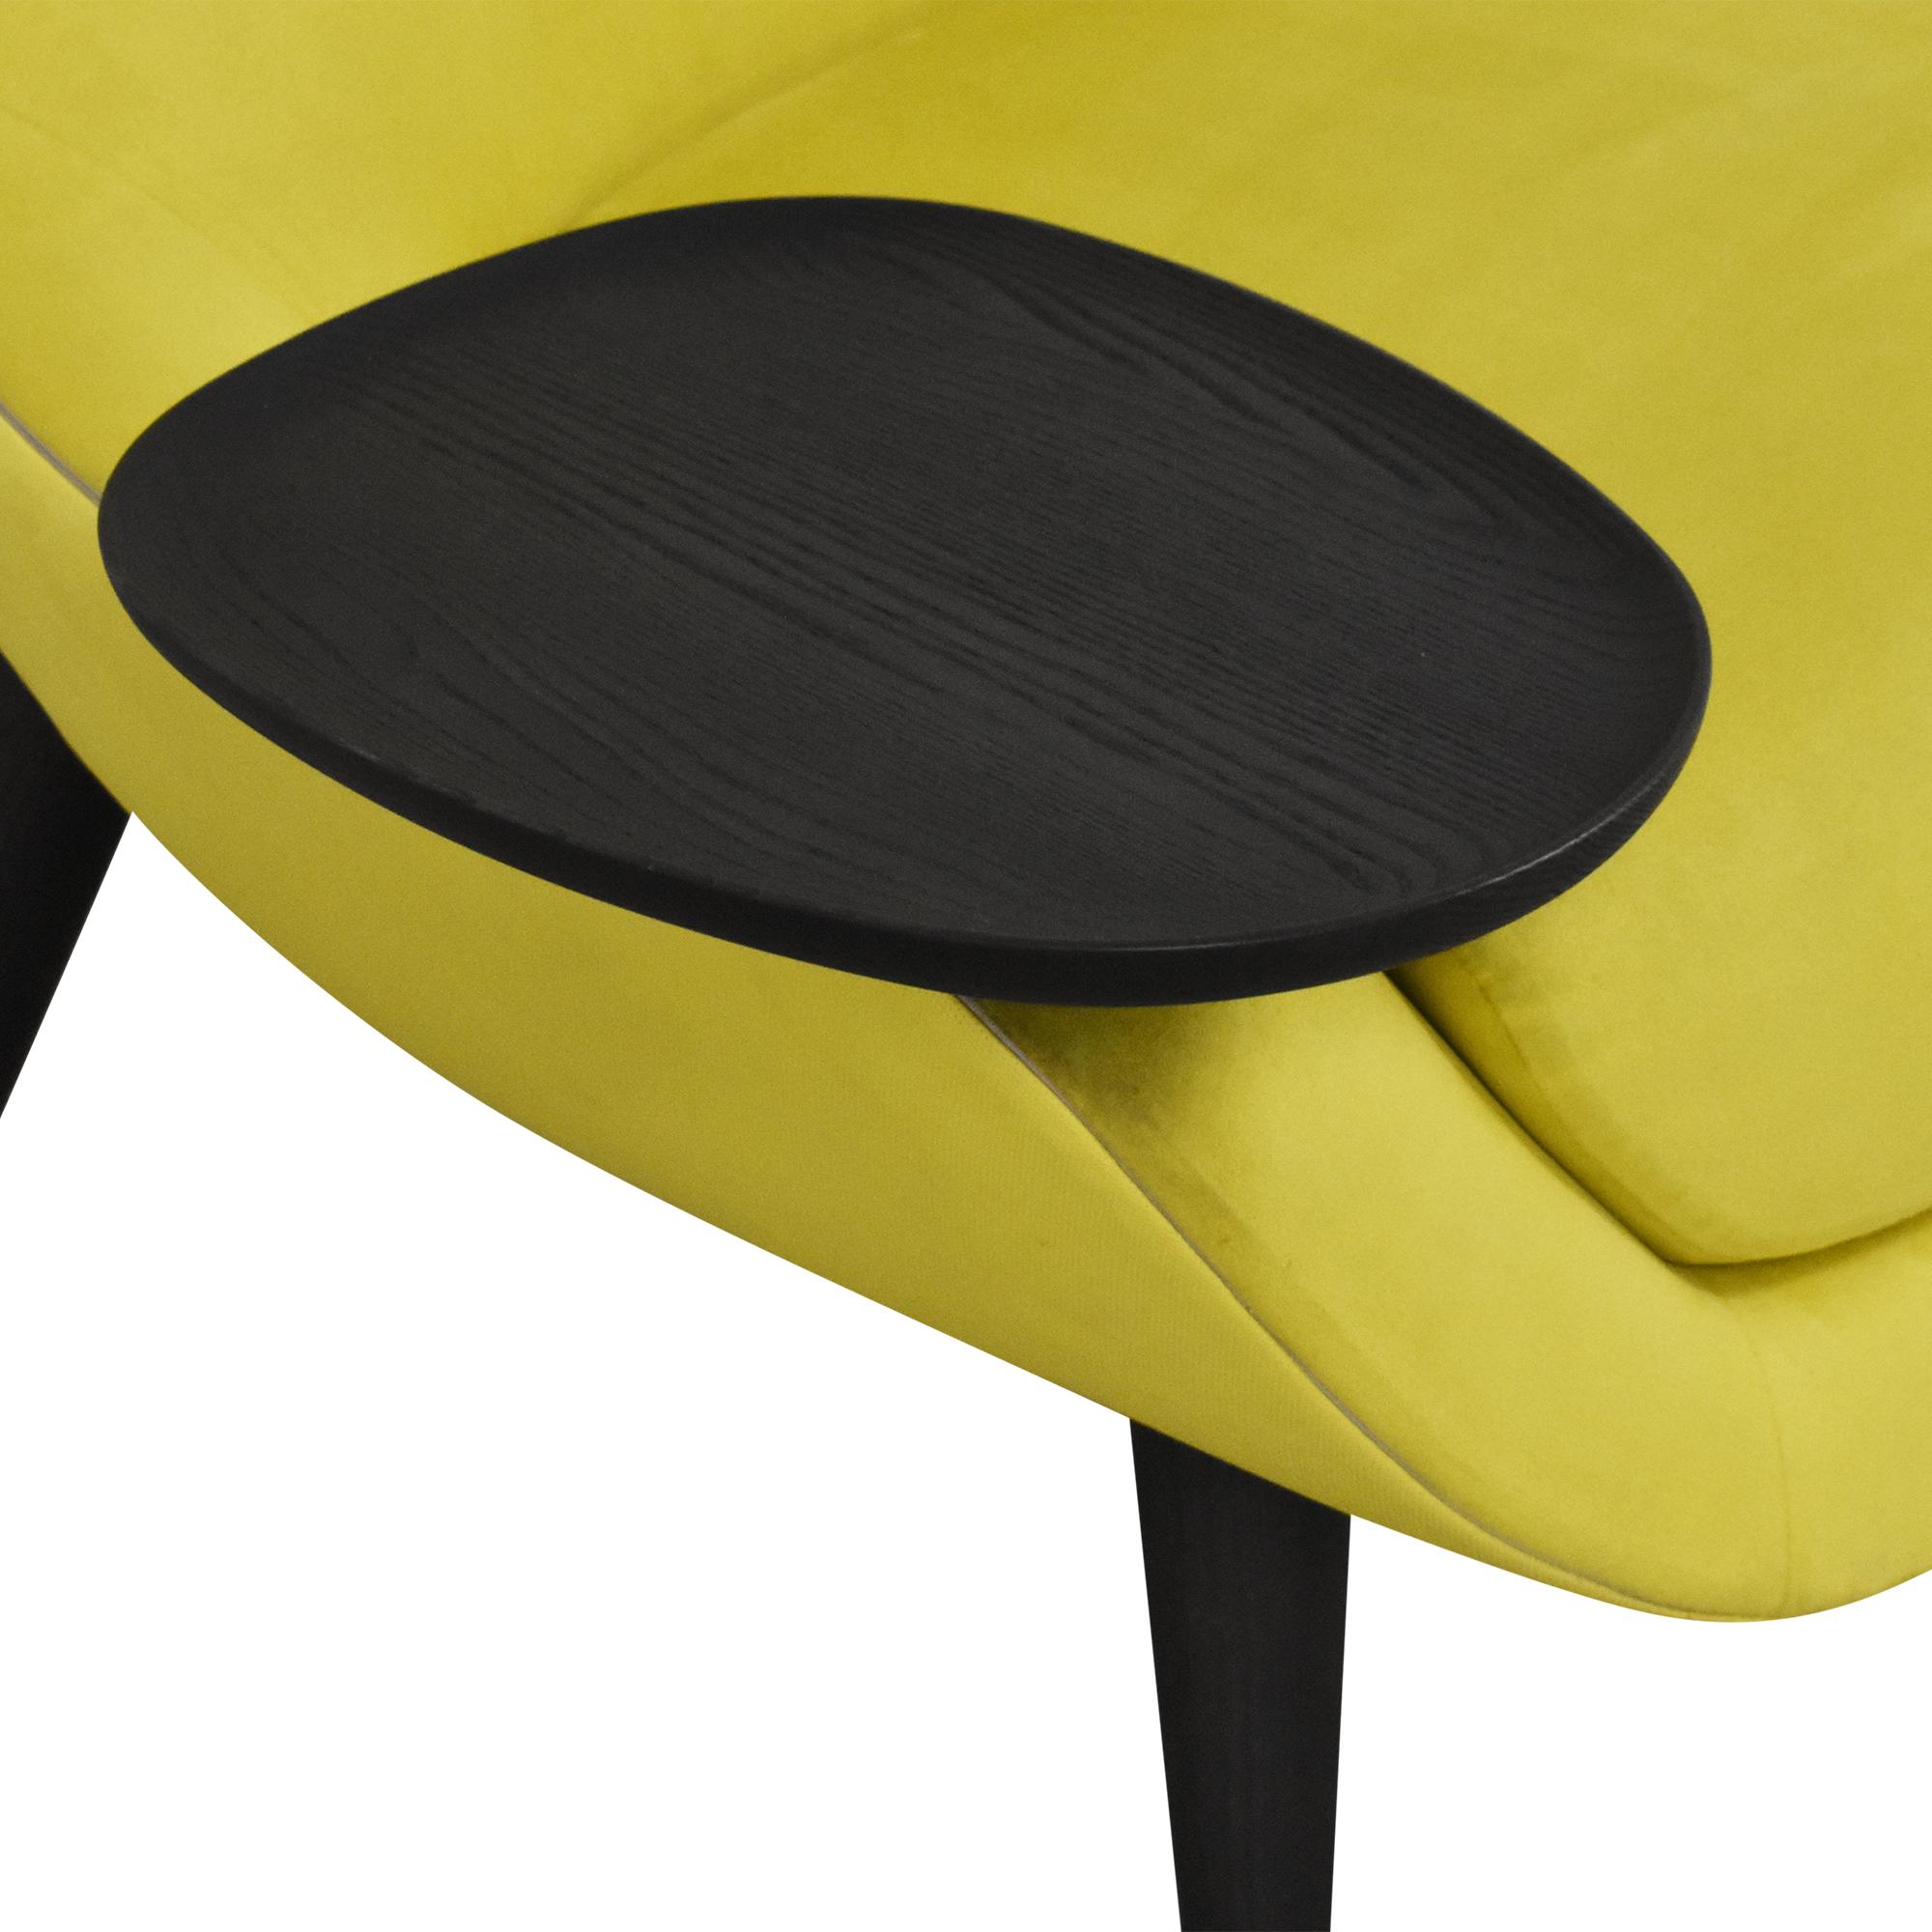 Poliform Poliform Mad King Chair discount